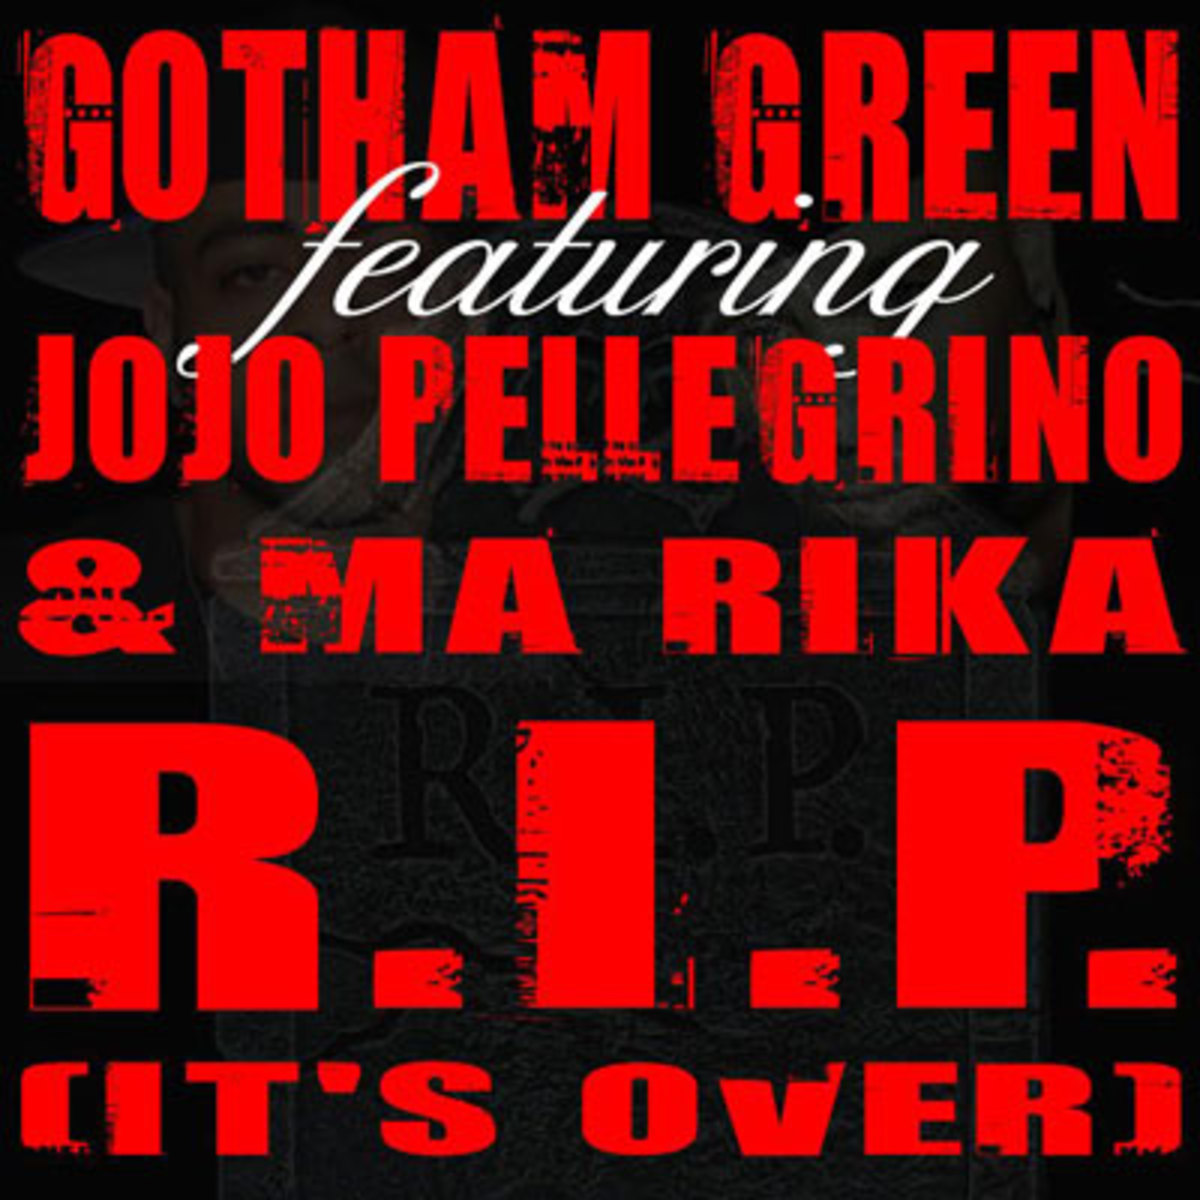 gothamgreen-rip.jpg